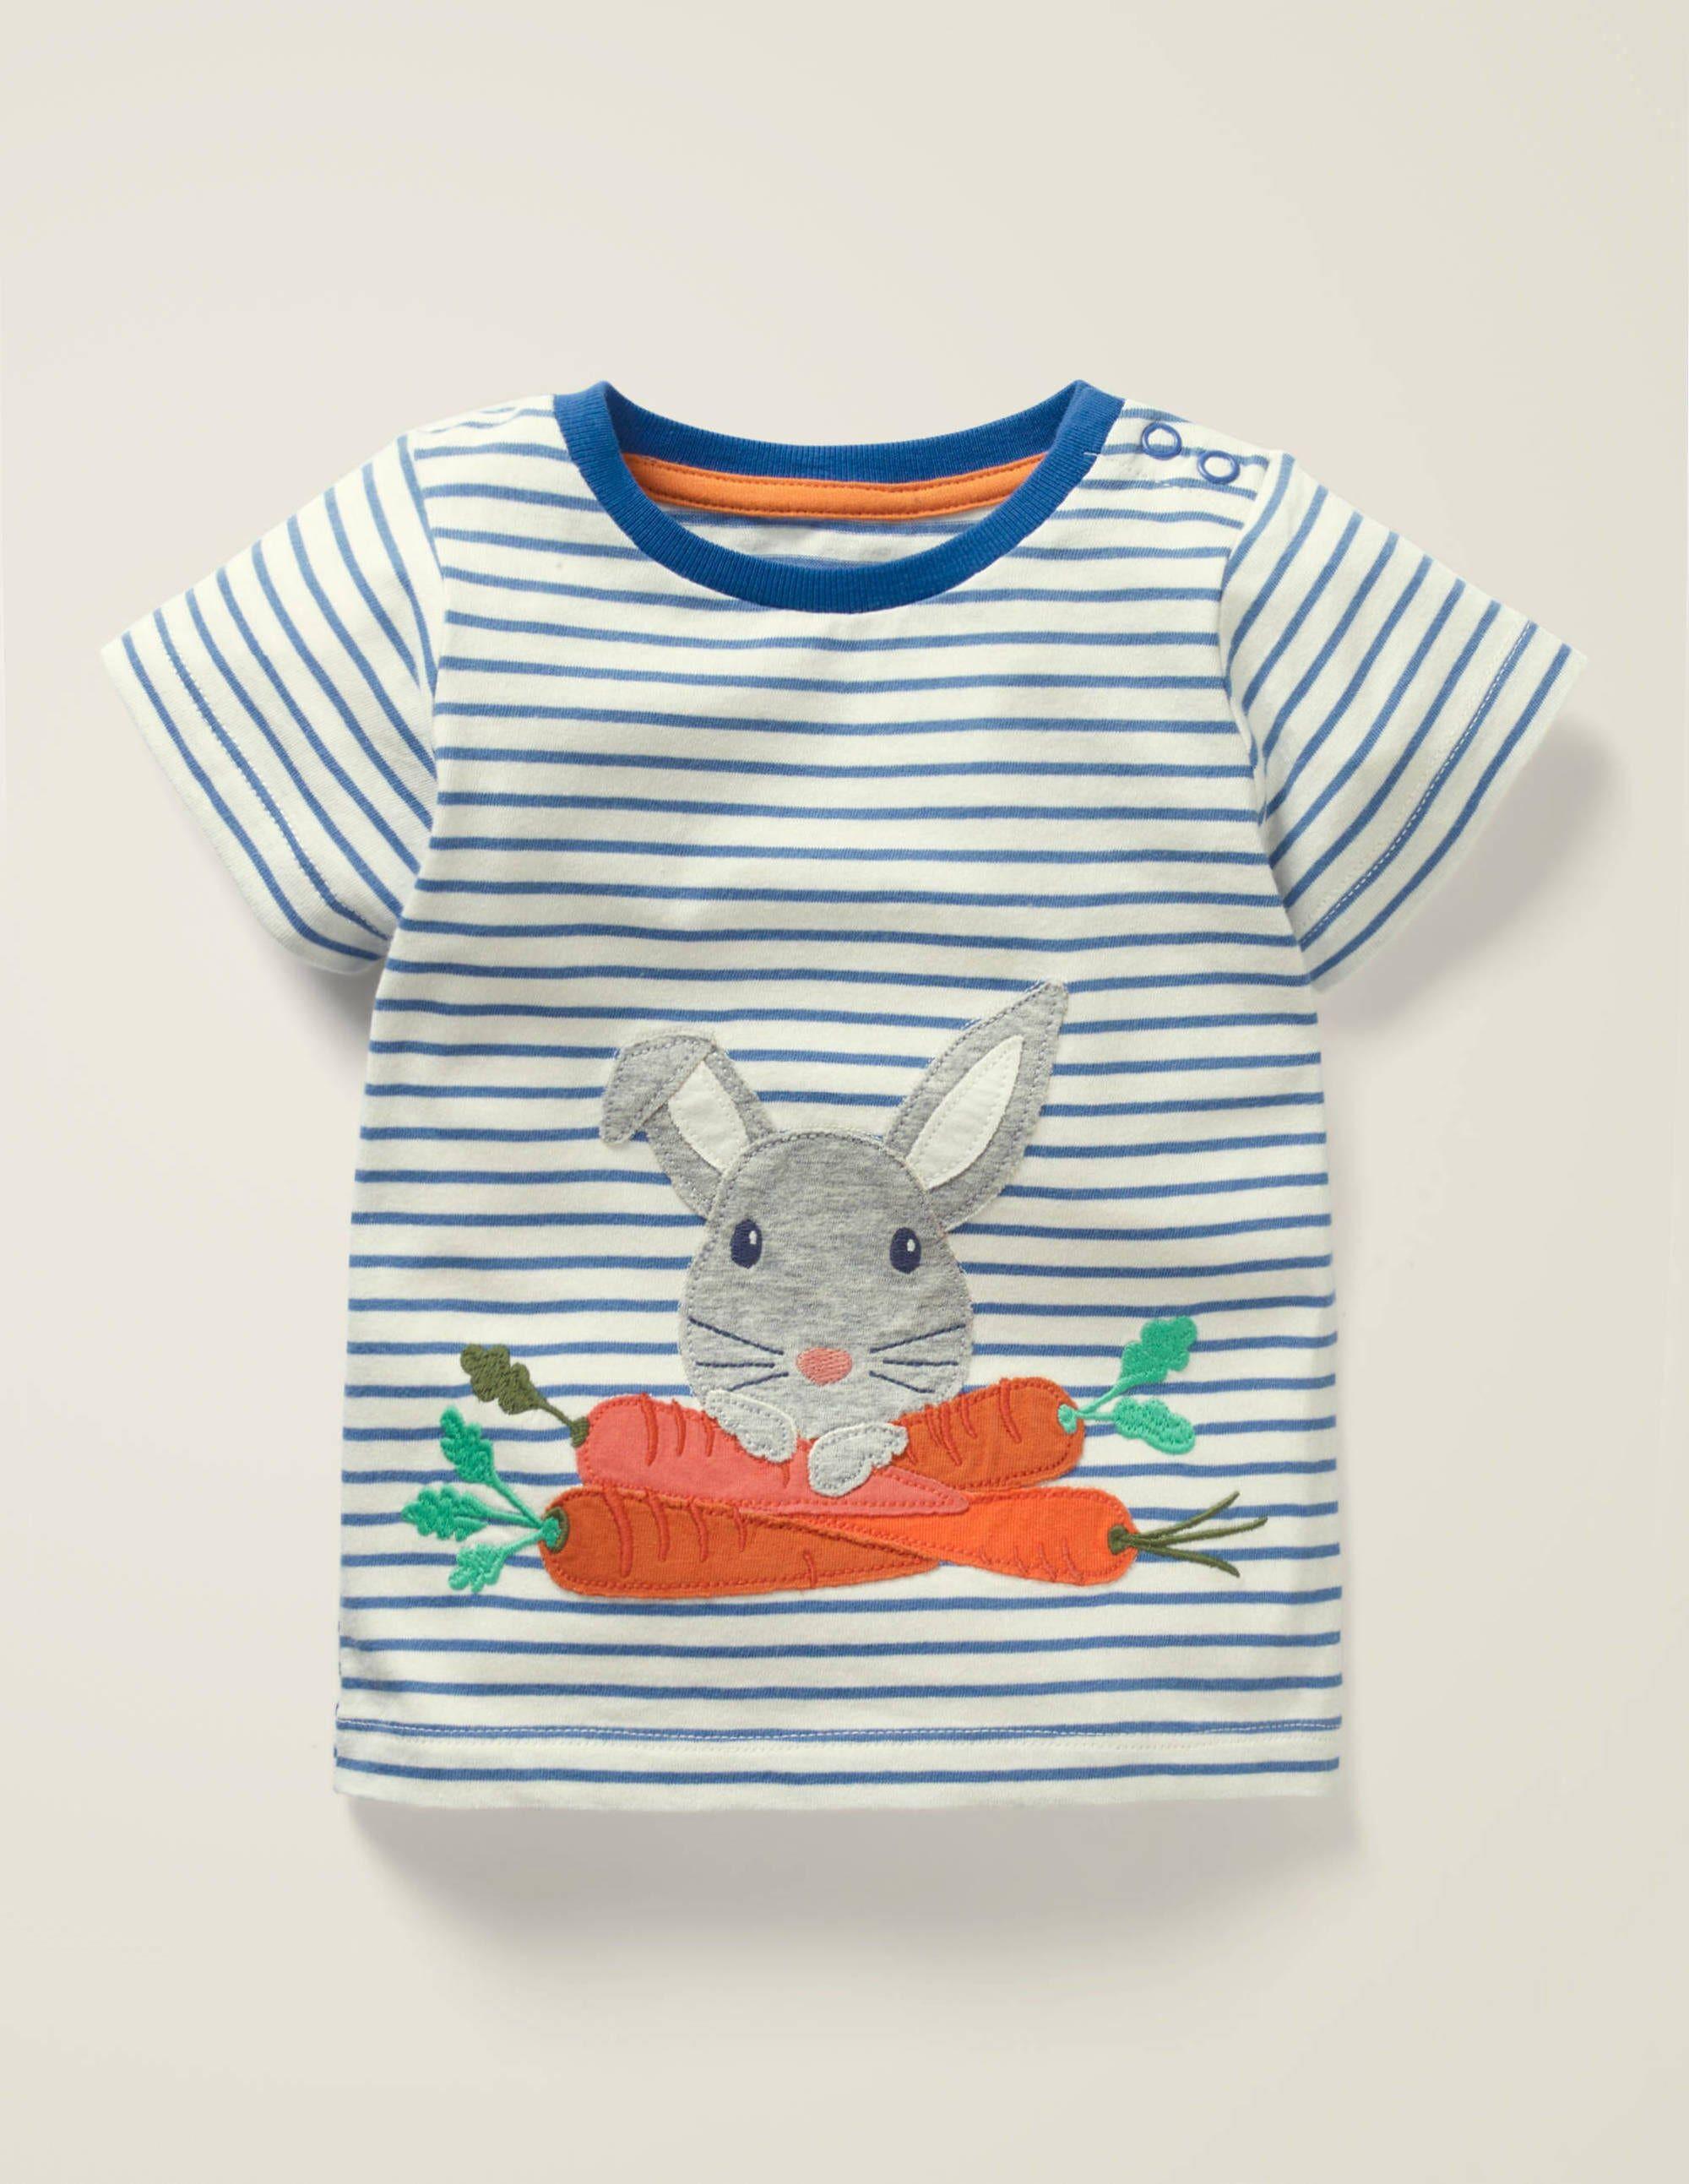 Baby T-shirt à appliqué animal BLU Bébé Boden, Blue - 2-3a